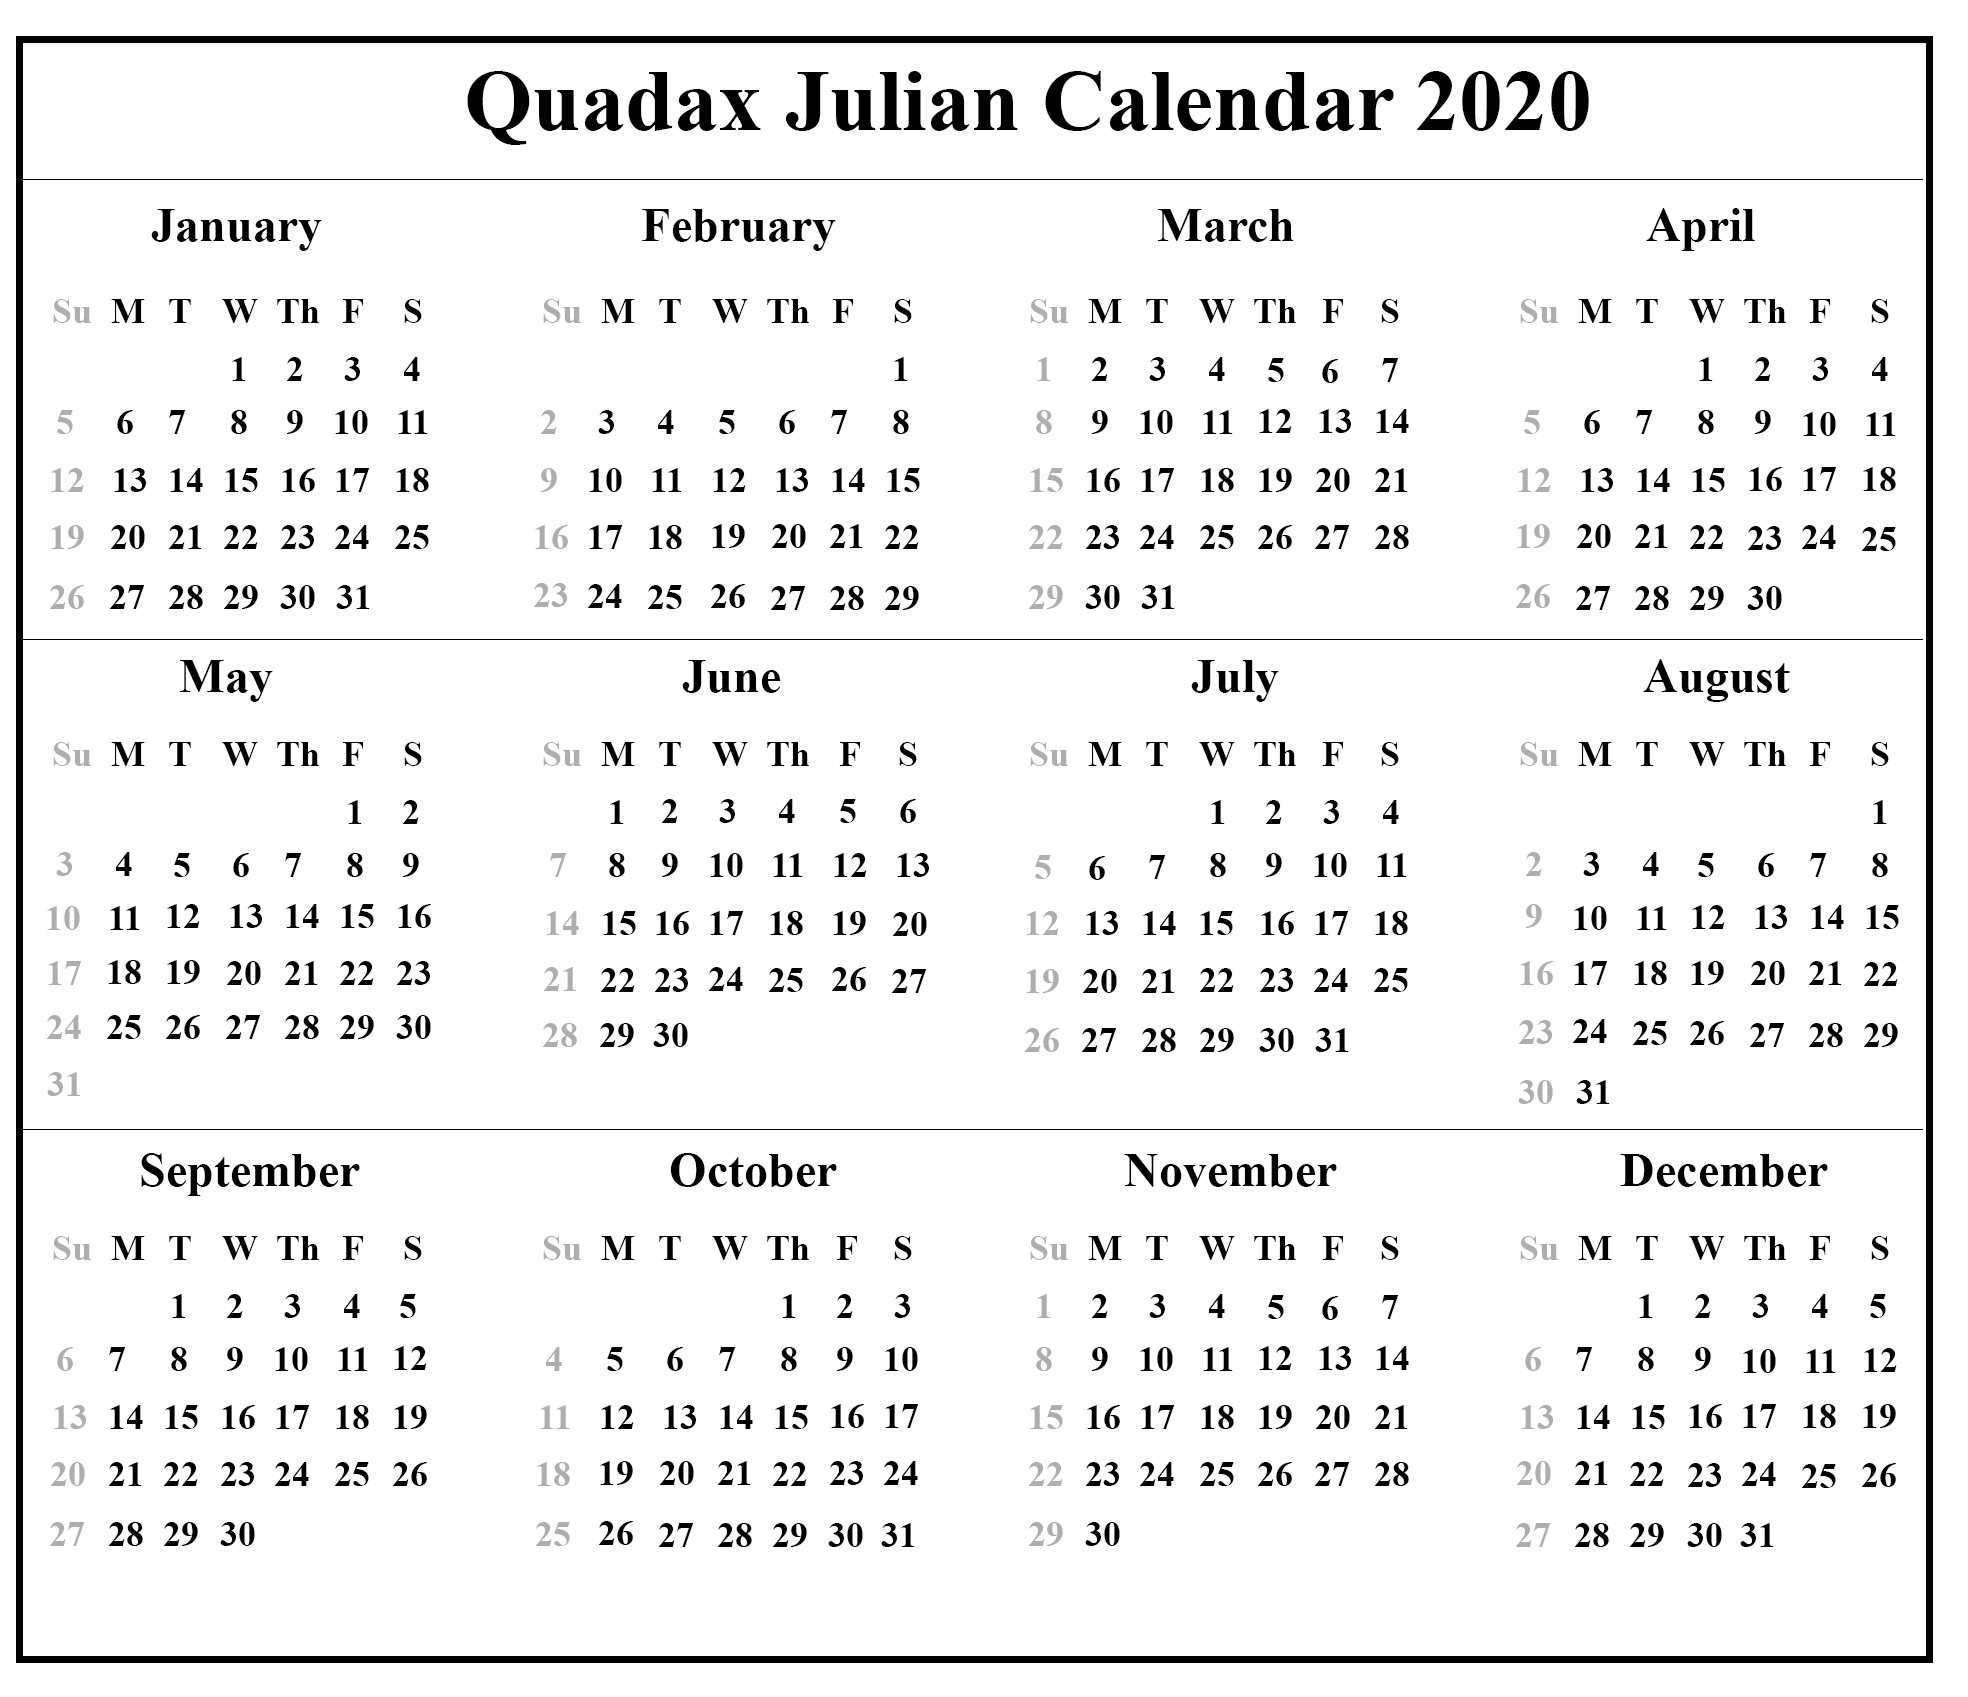 Julian Date Calendar Leap Year Pdf | Calendar For Planning Regarding Printable Julian Date Calendar Leap Year